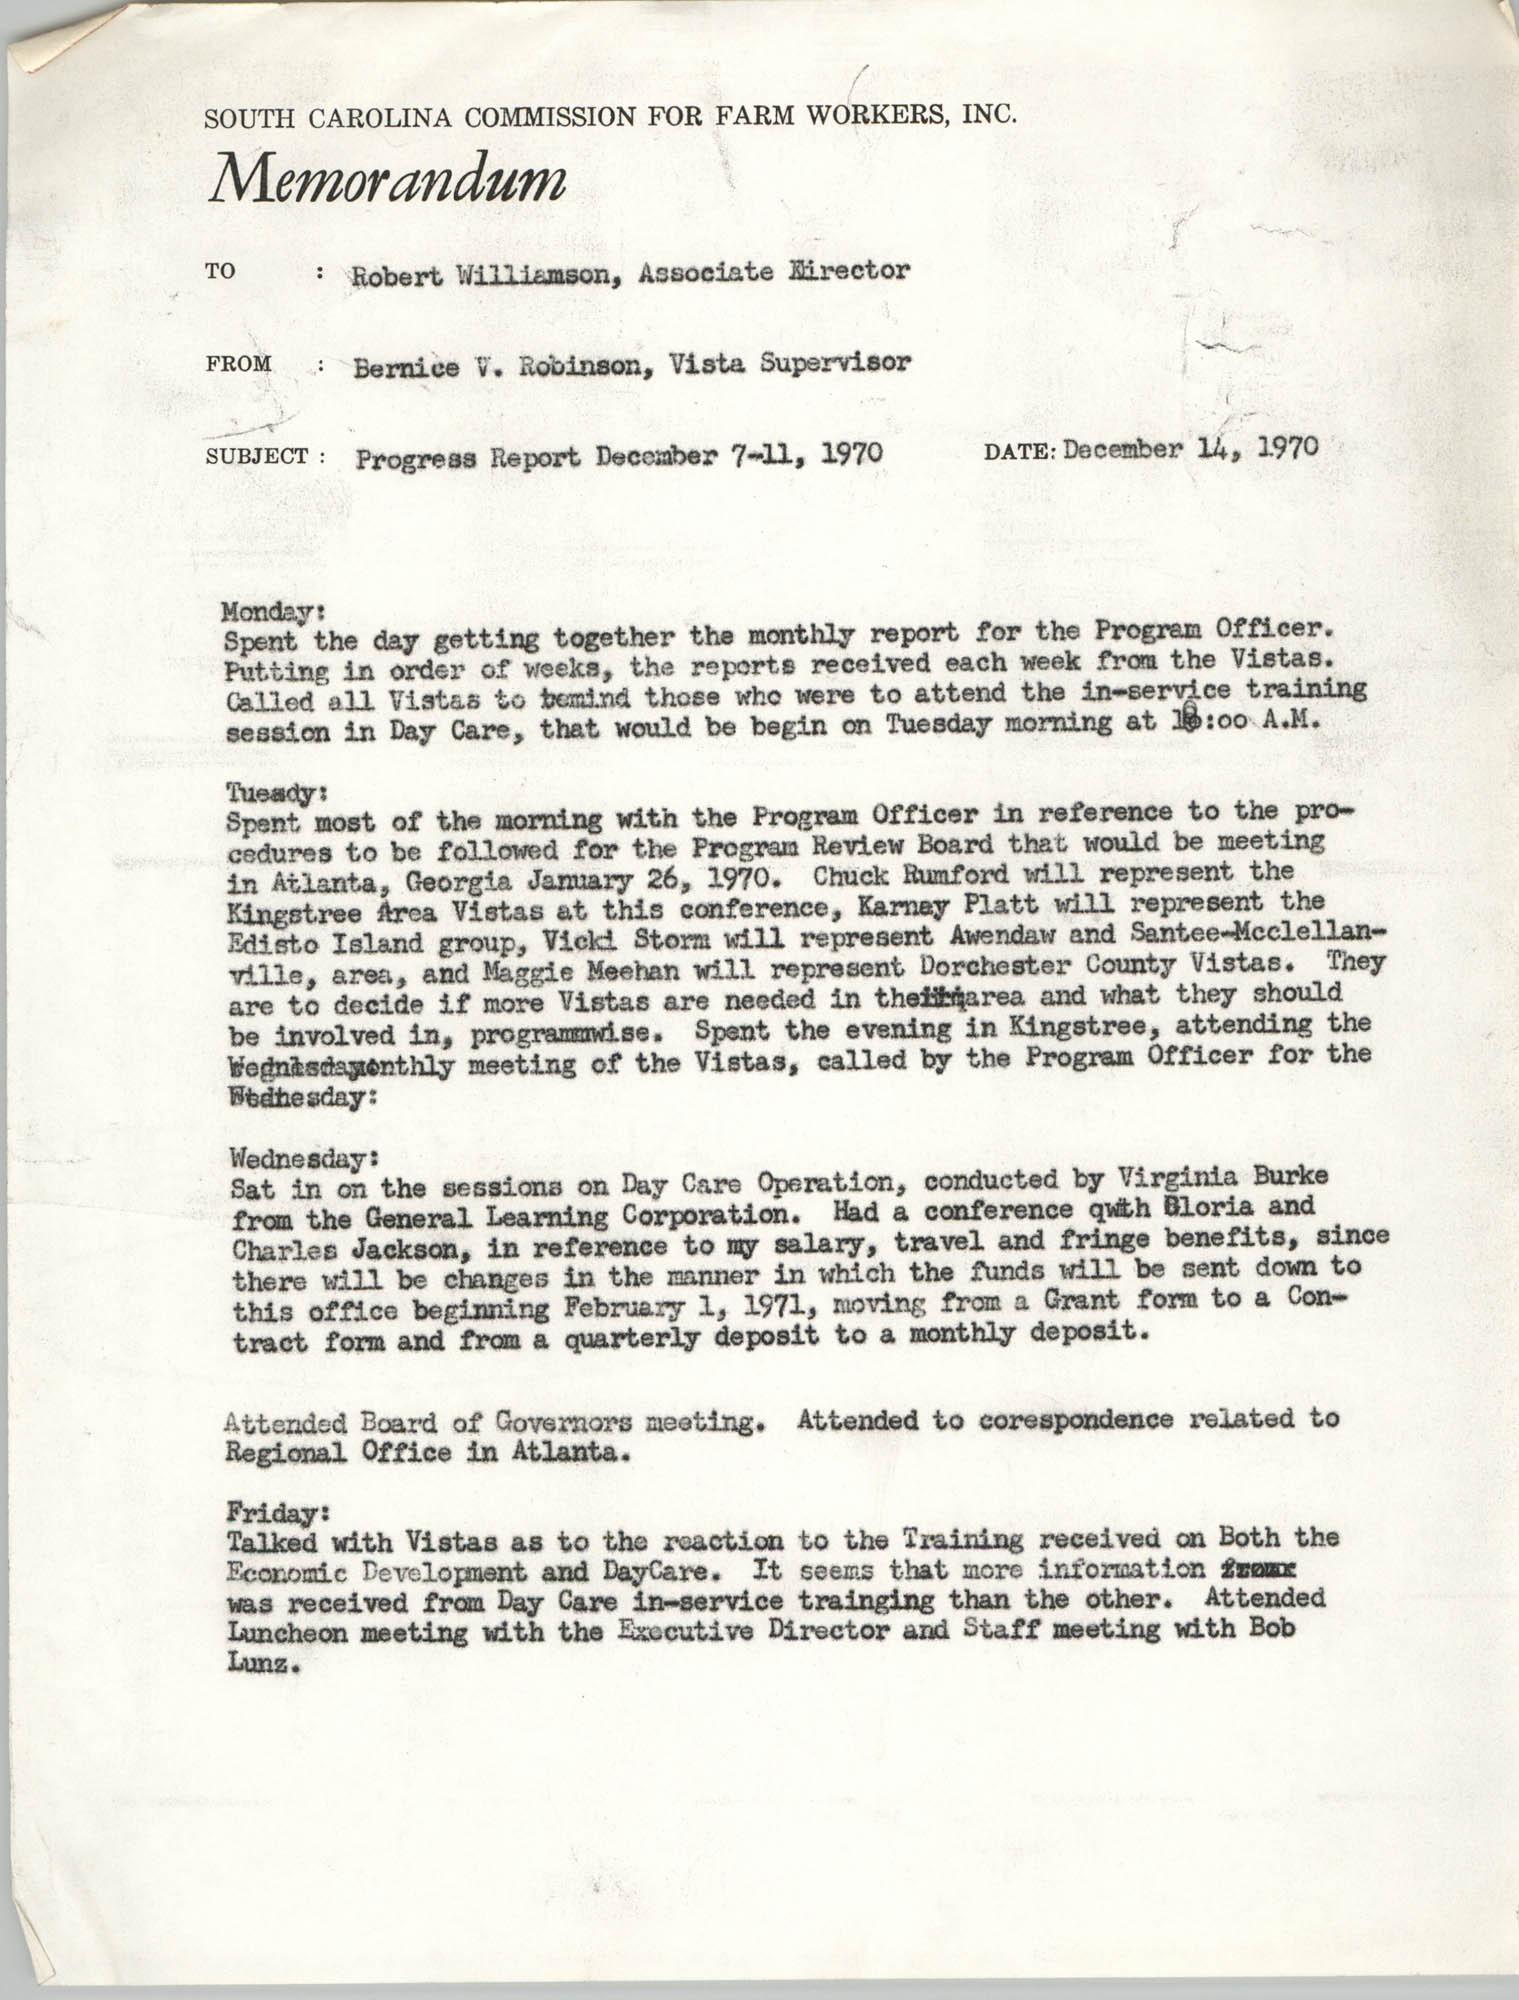 Memorandum from Bernice V. Robinson to Robert Williamson, December 14, 1970